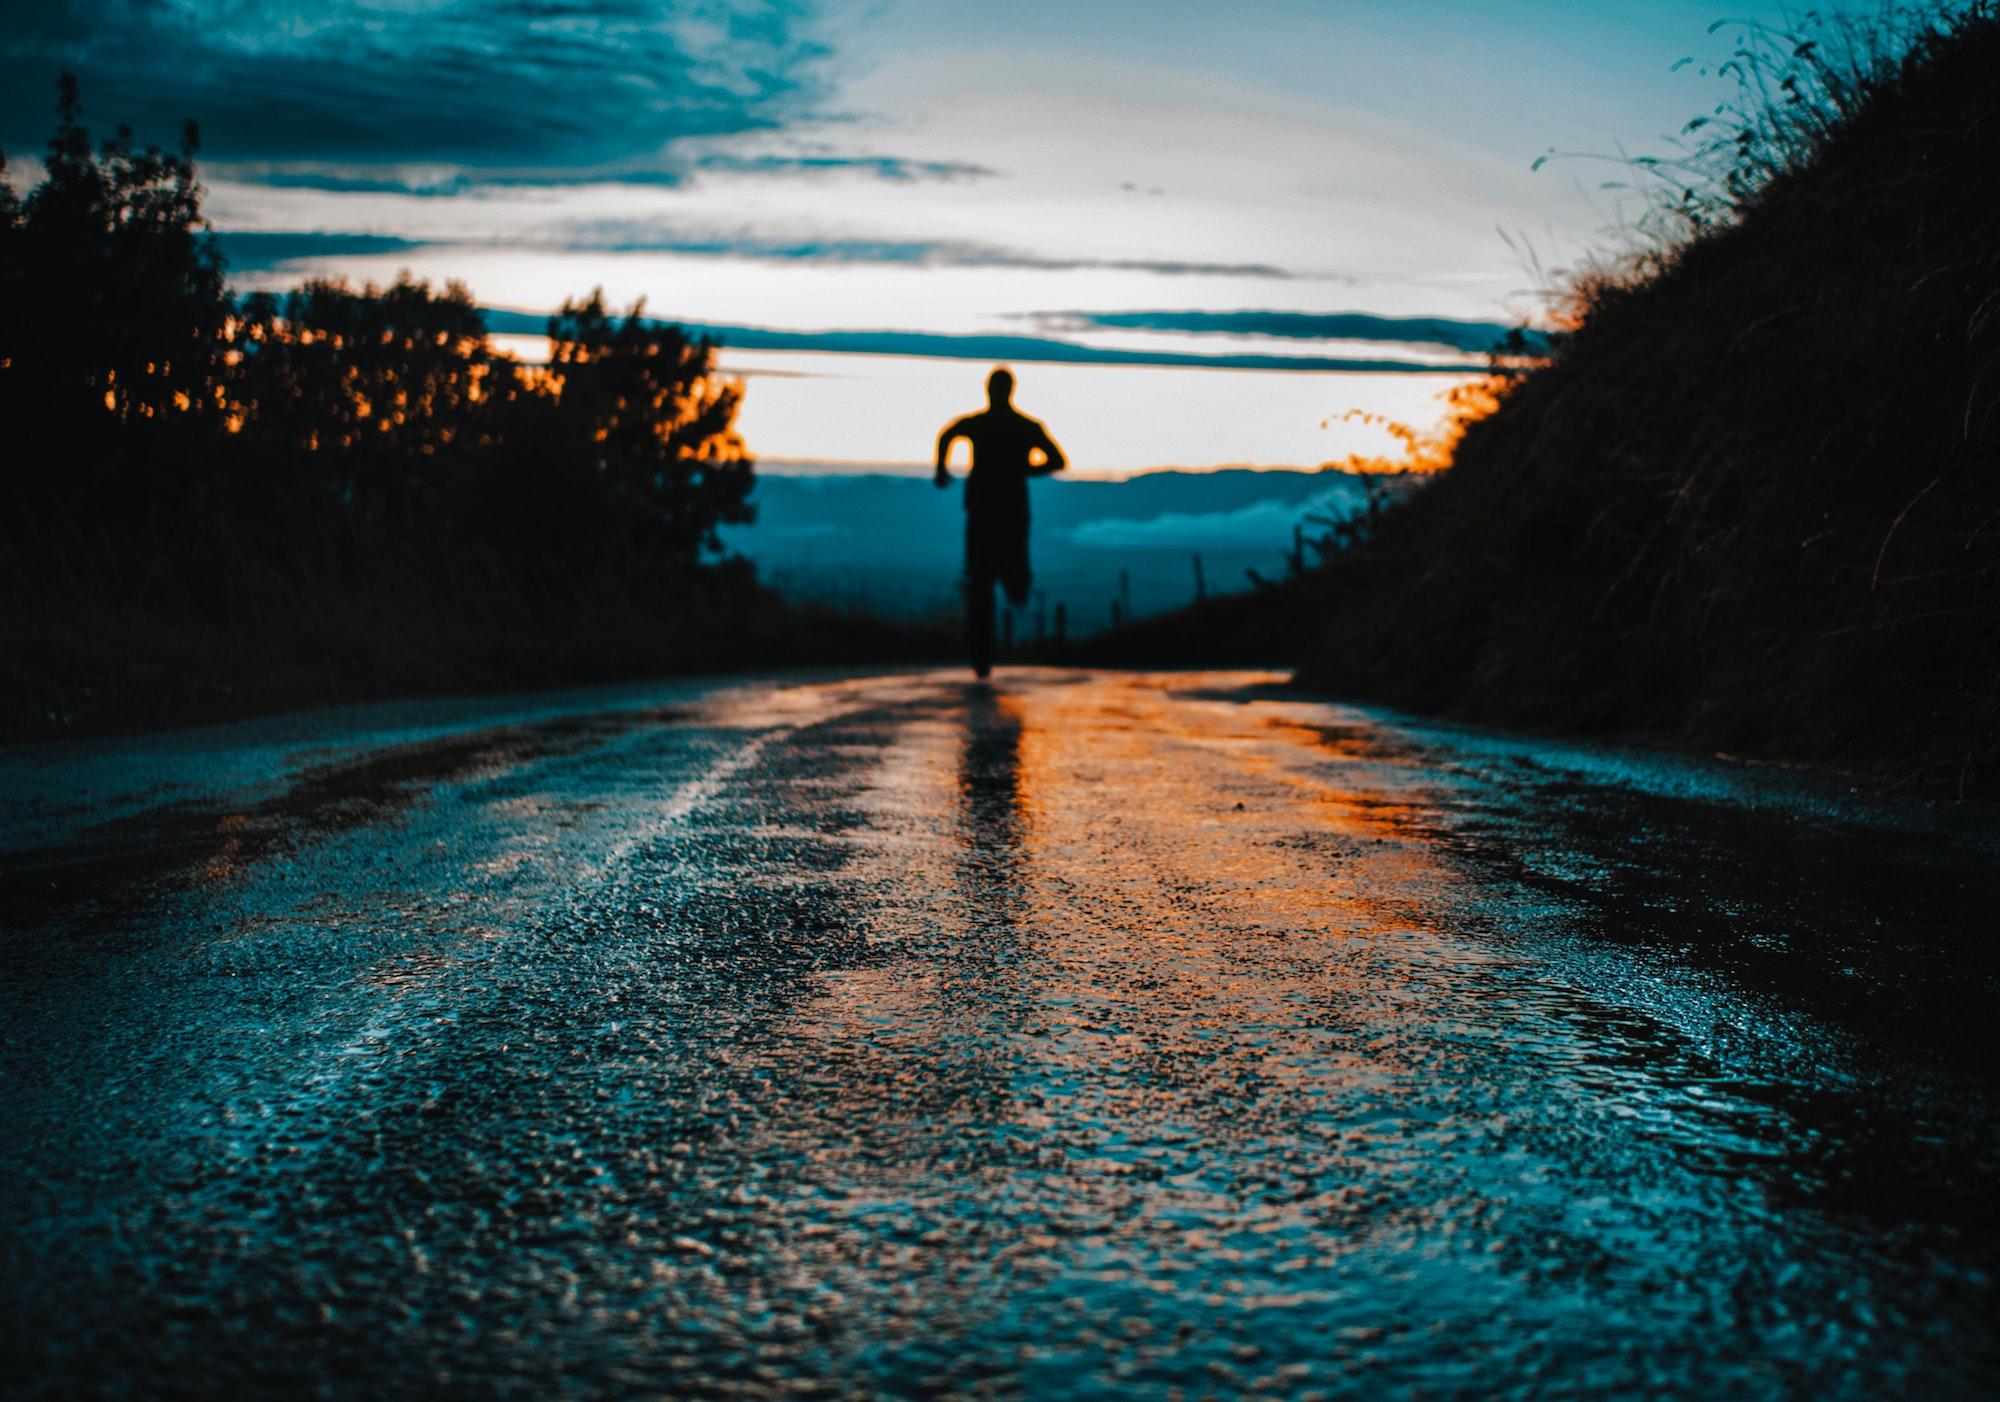 run rain or shine no excuses